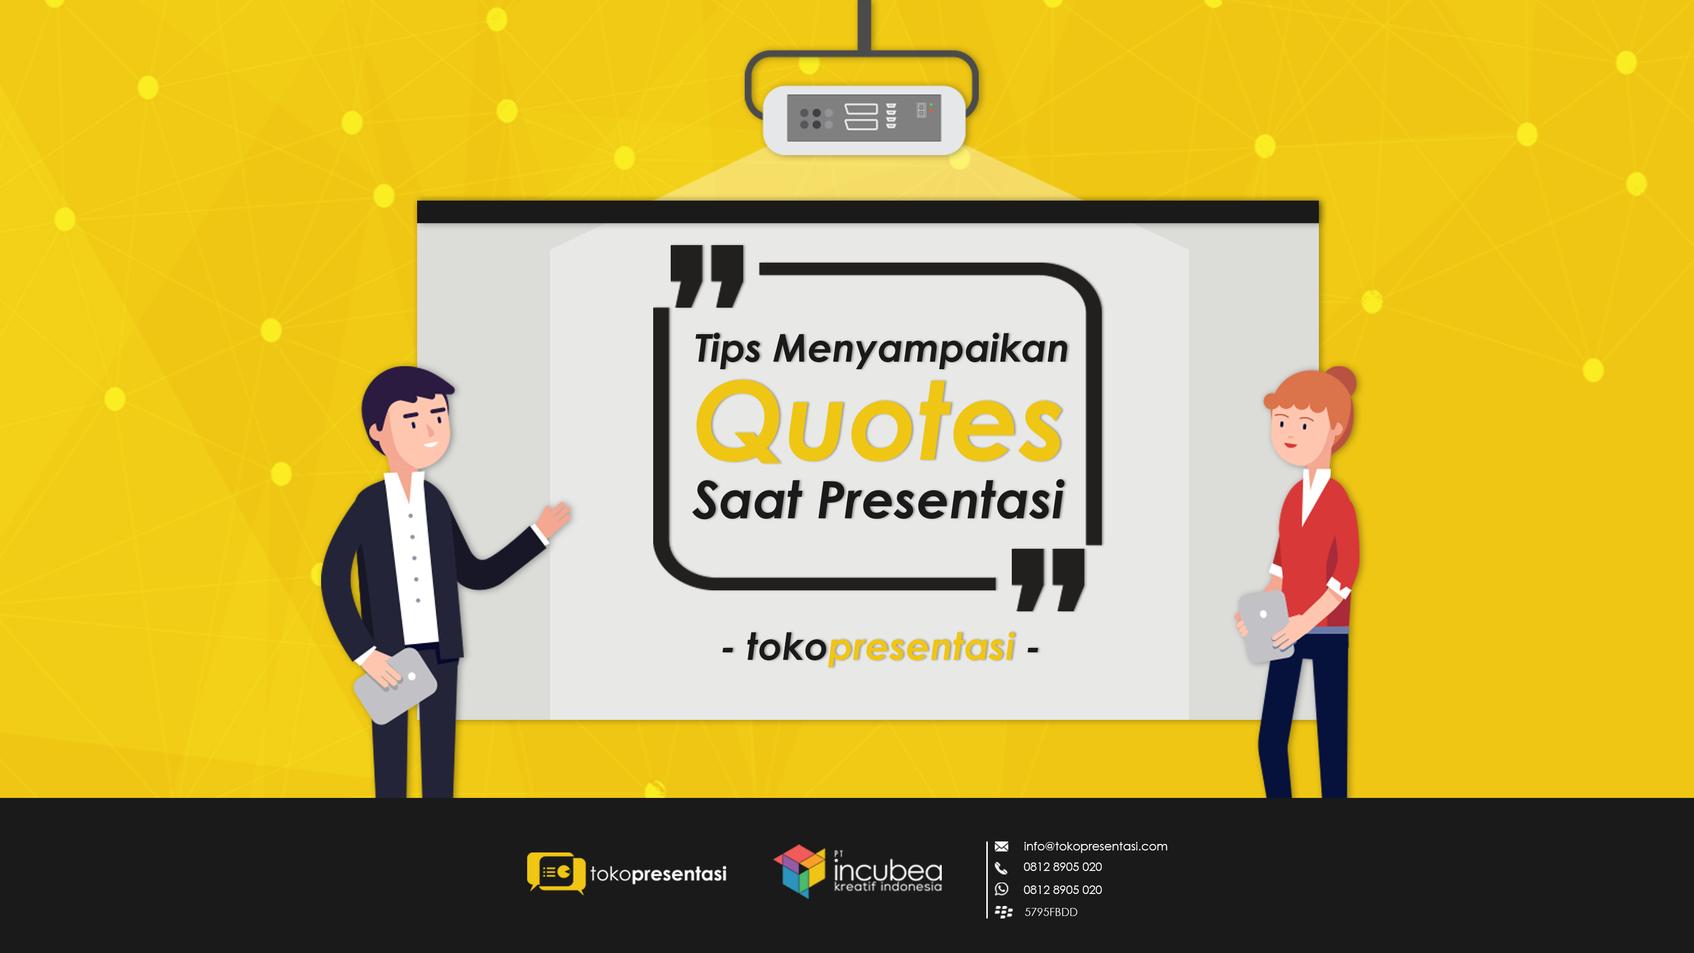 artikel_tips_menyampaikan_quotes_saat_presentasi_tokopresentasi-